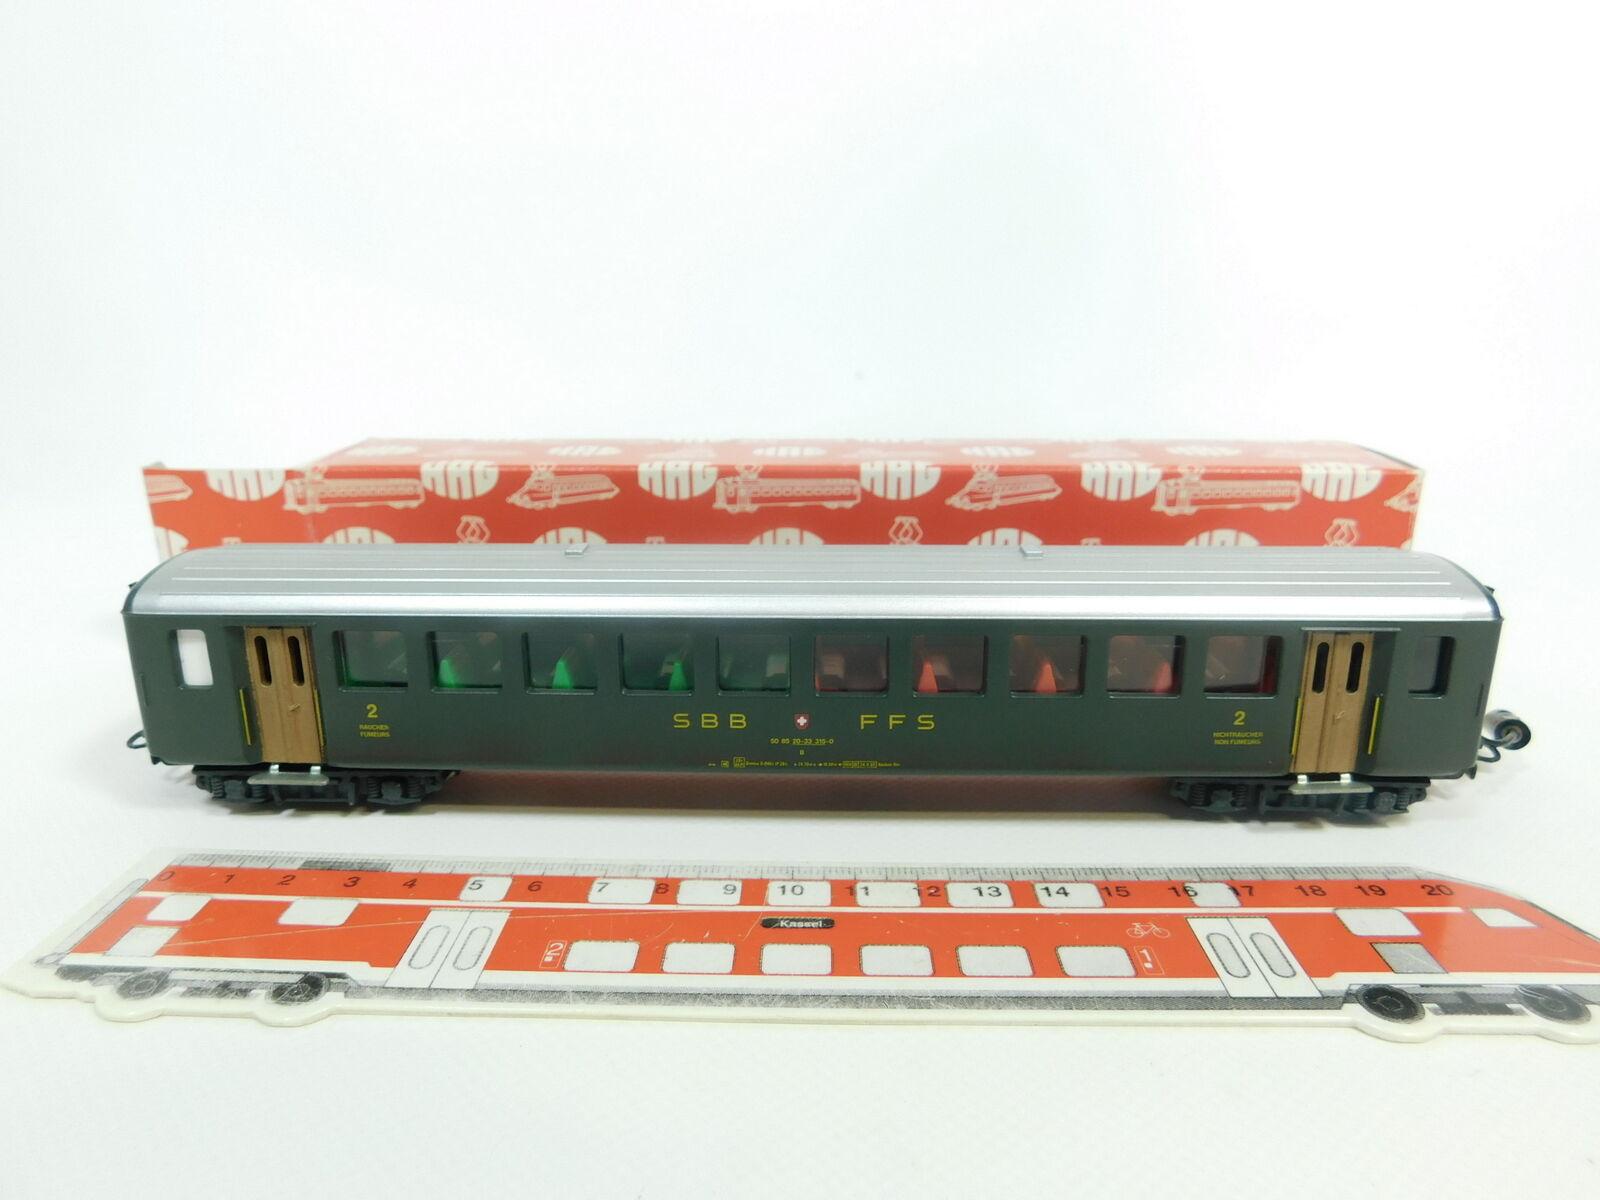 Bd118-0, Bd118-0, Bd118-0, 5  HAG h0 ac 400 vetture passeggeri 2. classeE SBB CFF illuminato molto bene + OVP 3828b4